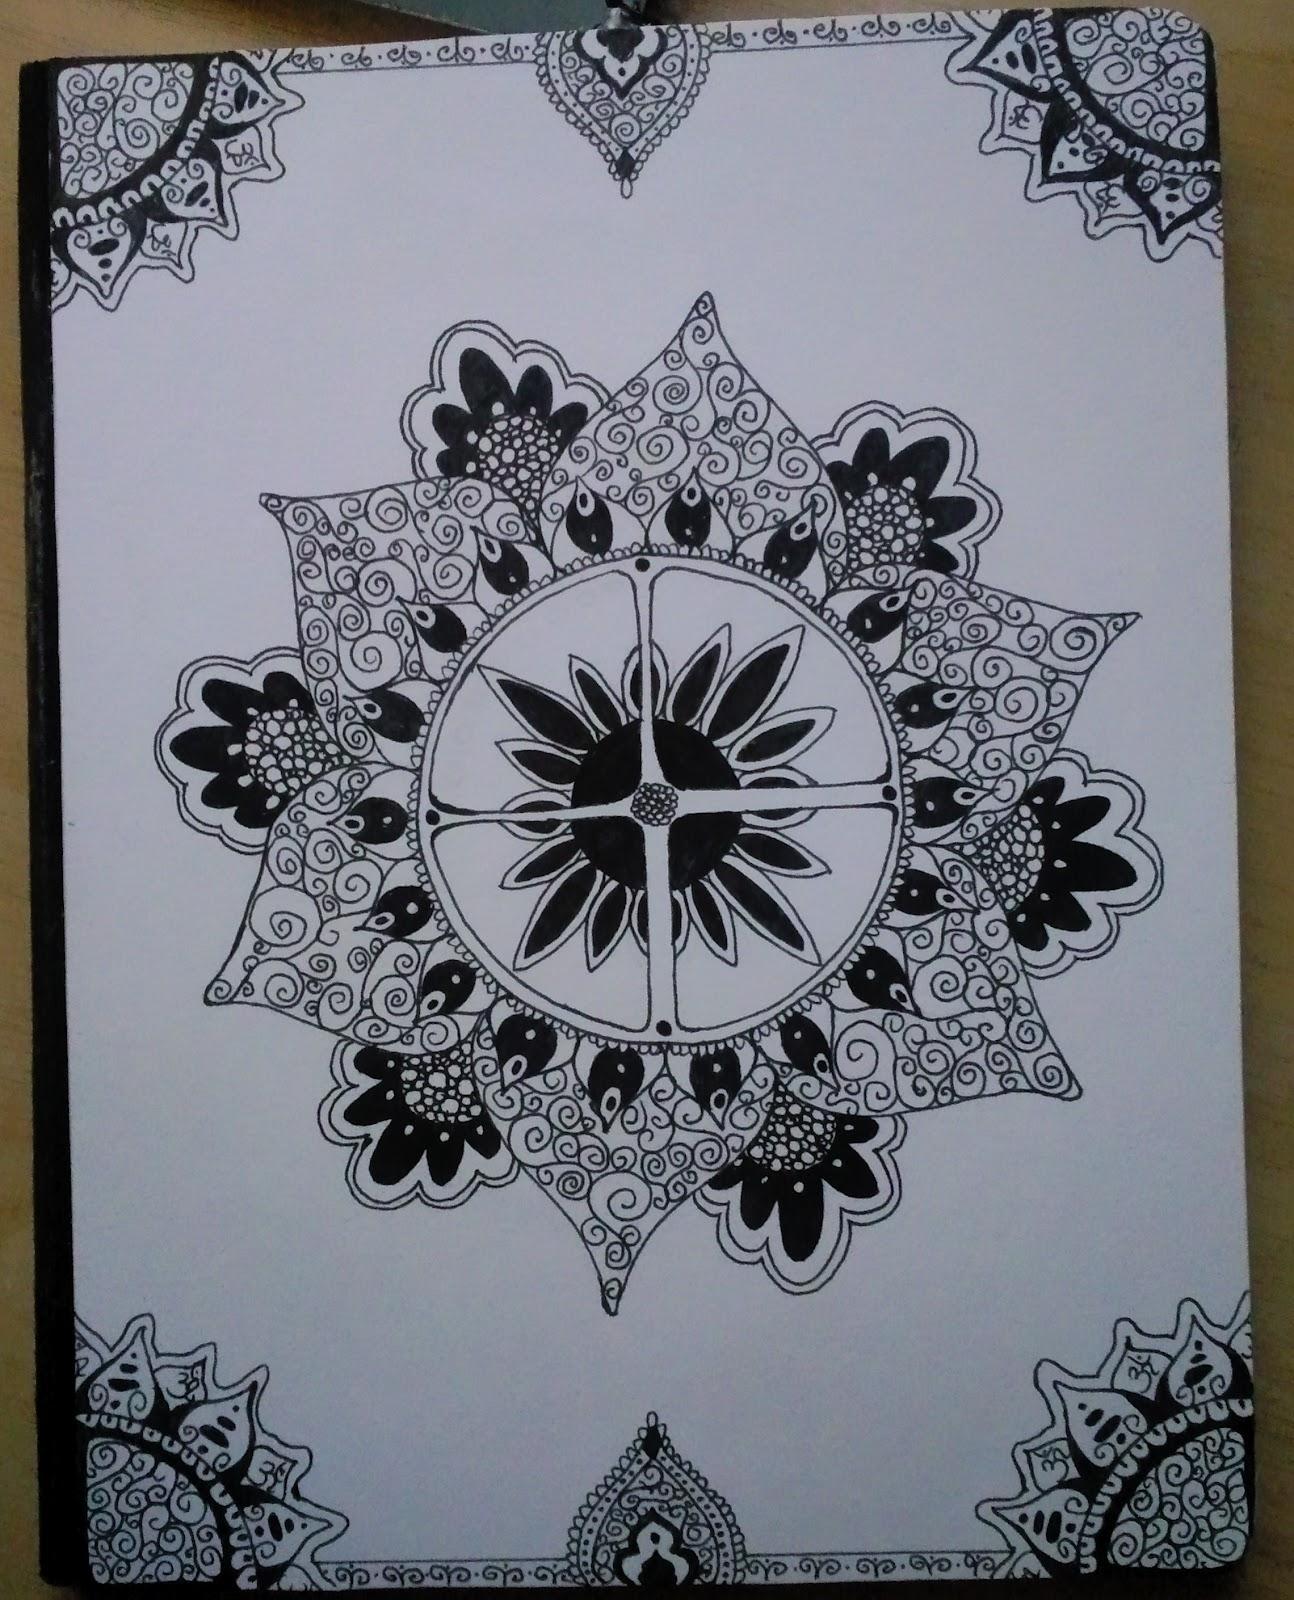 Memoria de tr nsito dibujos para decorar libretas for Imagenes de estanques decorados